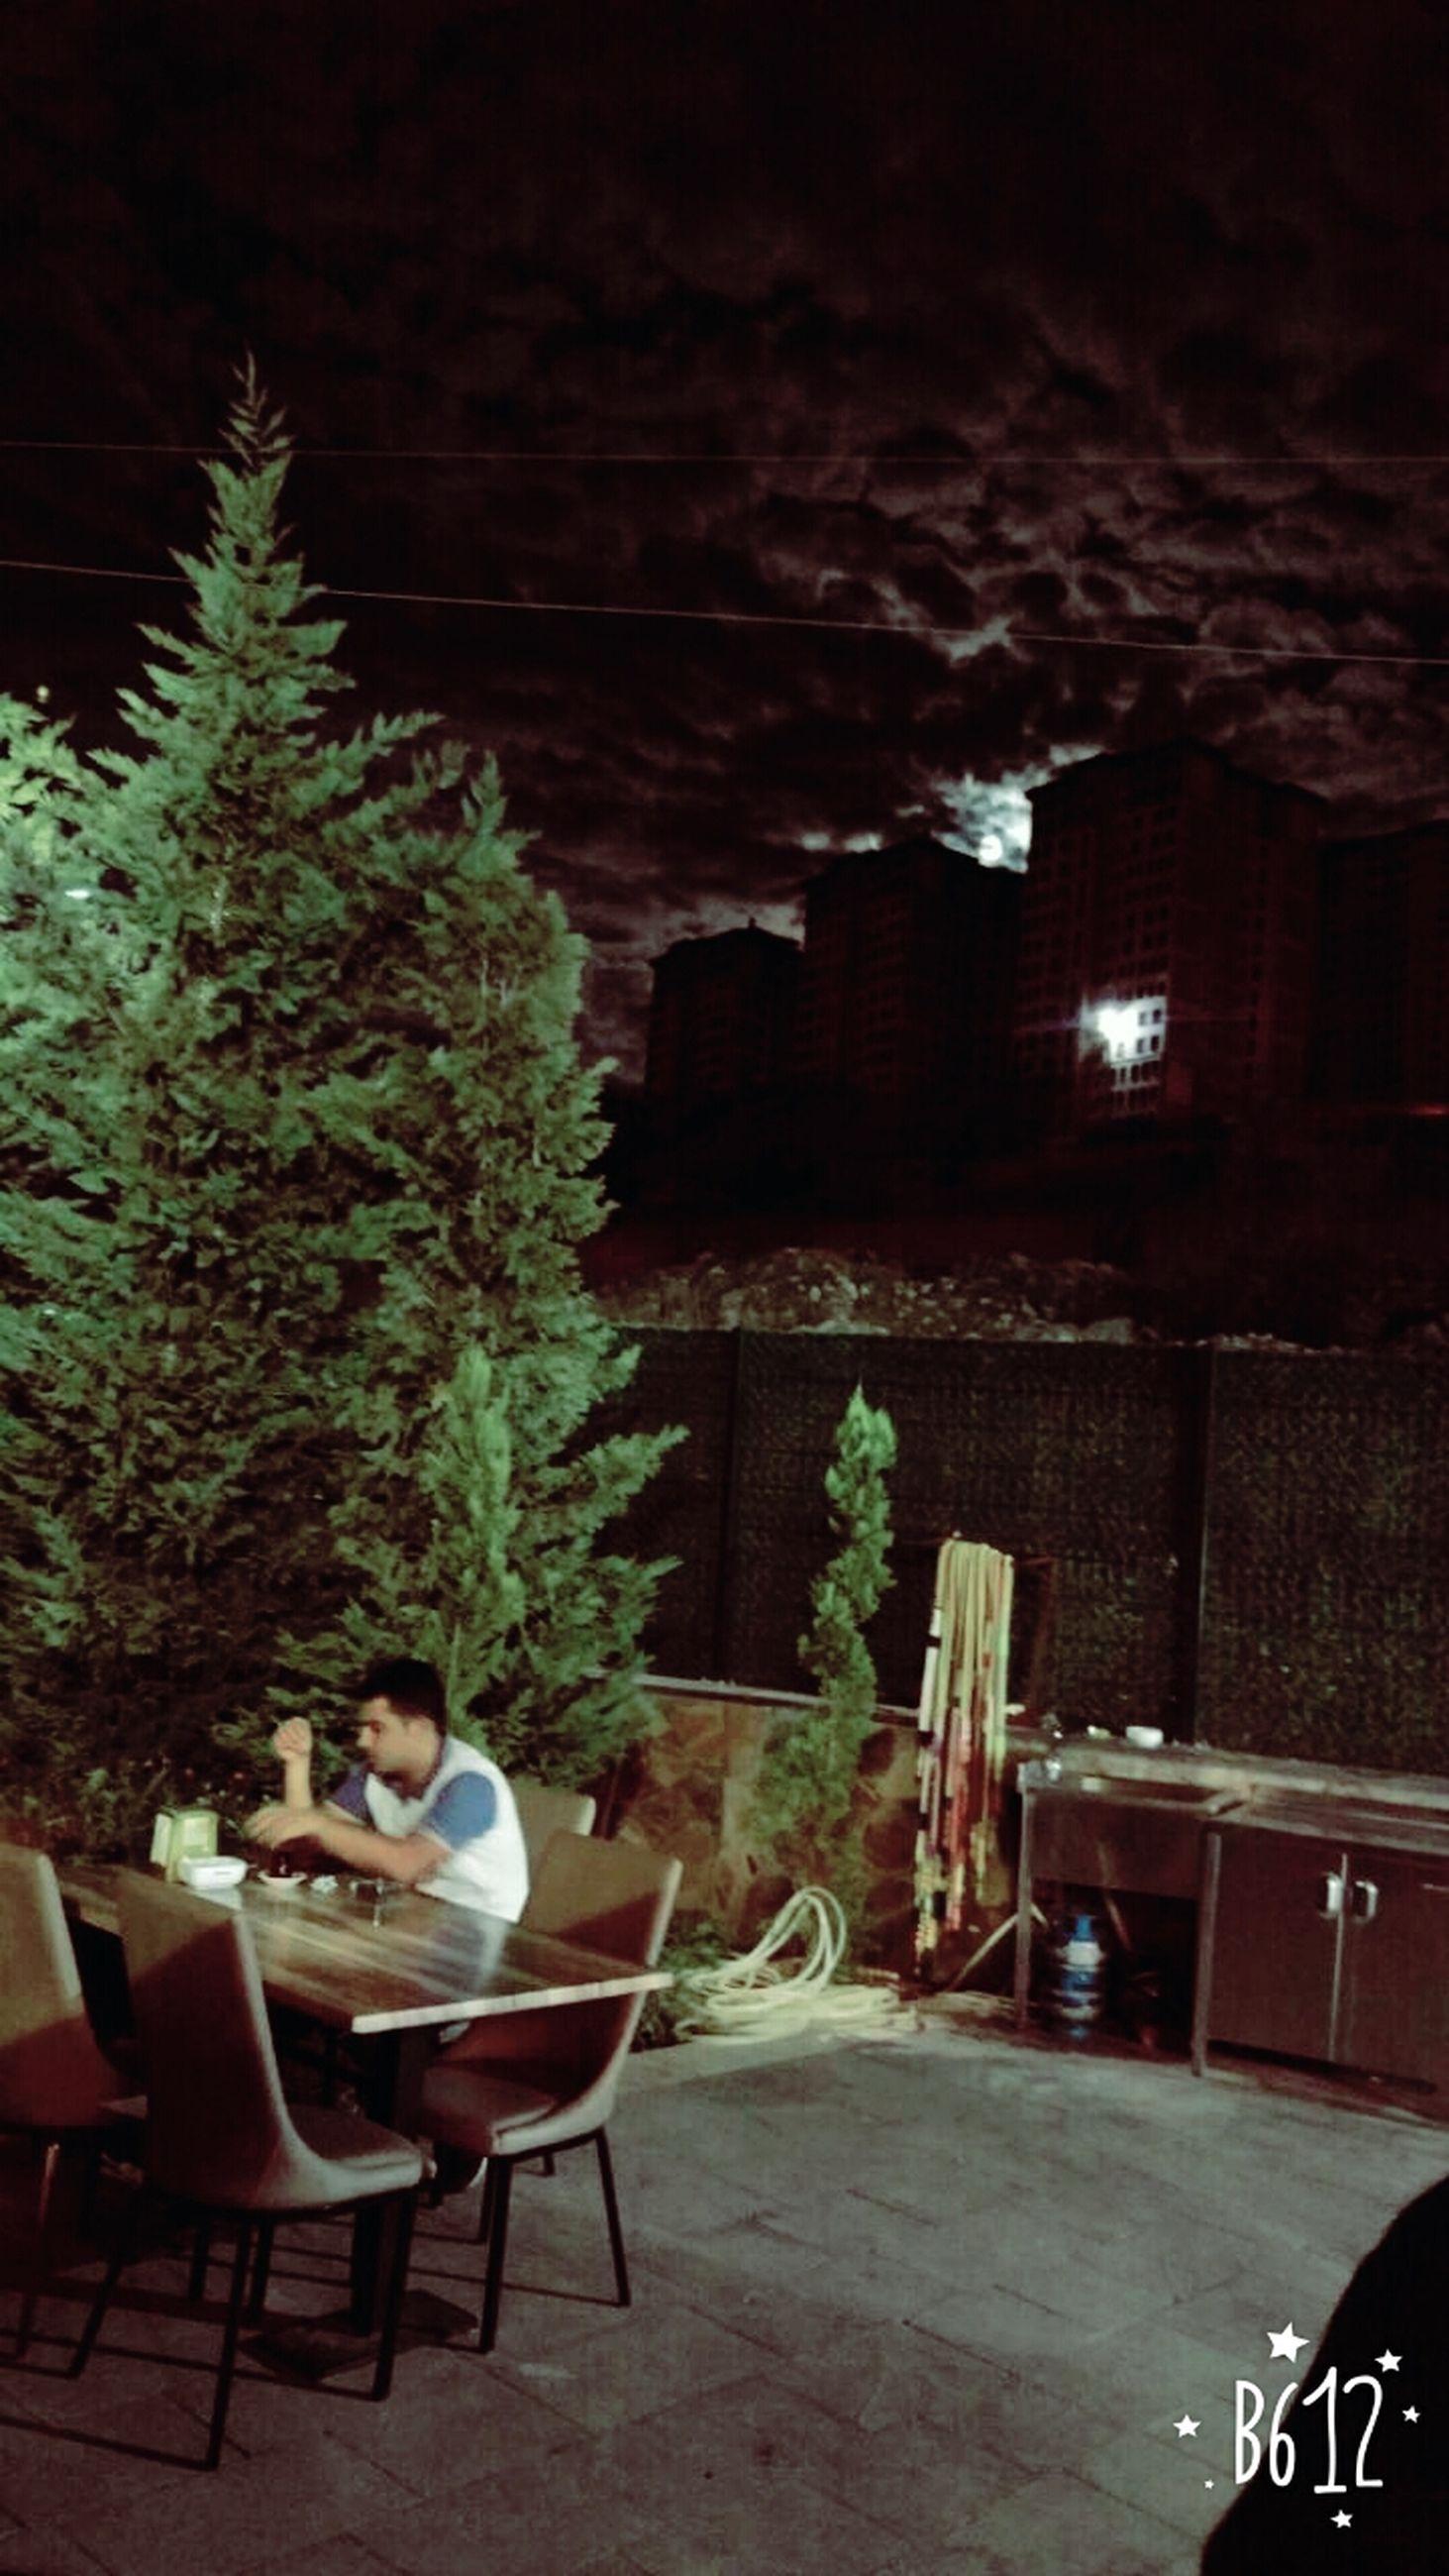 tree, table, night, dining table, chair, celebration, indoors, illuminated, christmas tree, no people, nature